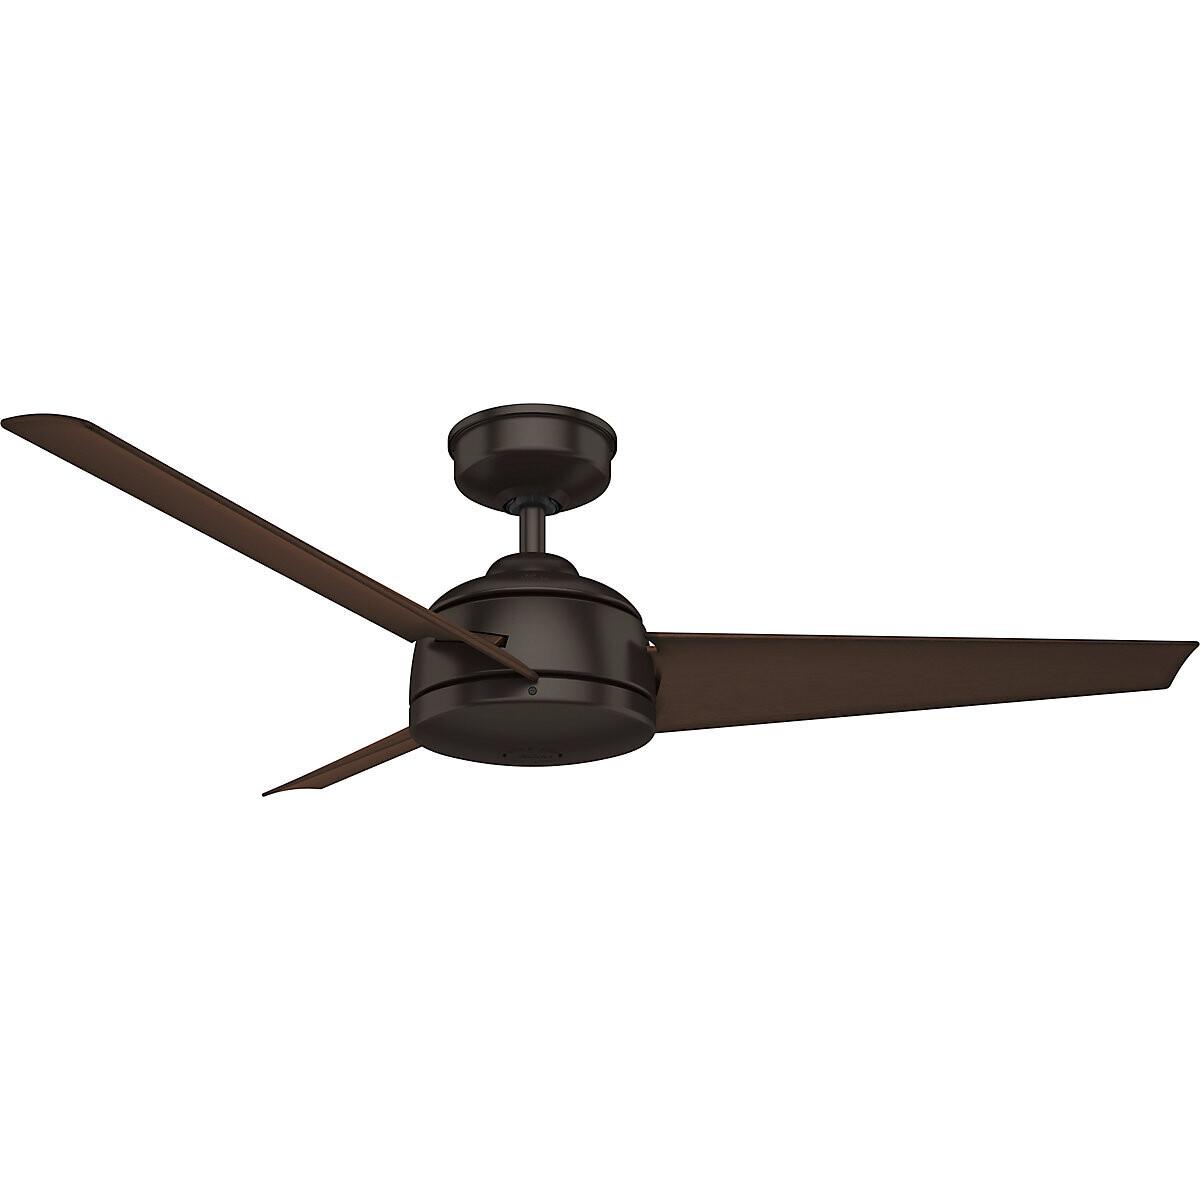 HUNTER TRIMARAN PREMIER BRONZE outdoor ceiling fan Ø132cm wall control included